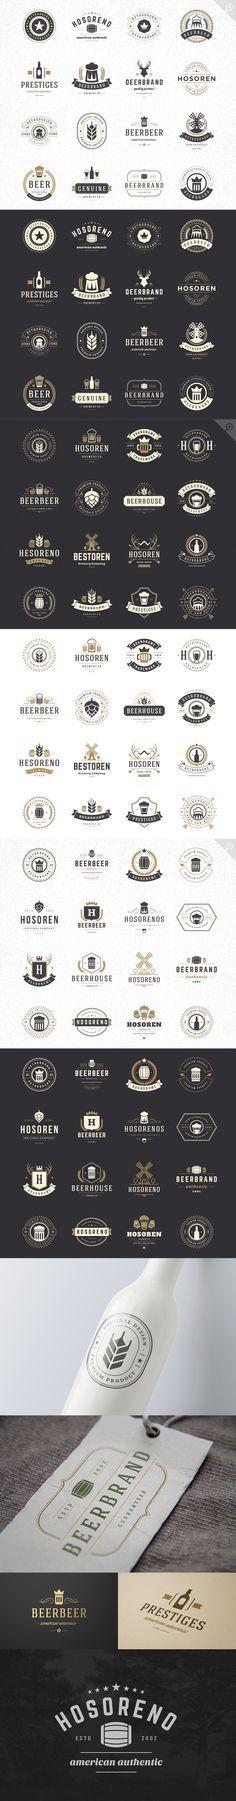 45 Beer brewery Retro Vintage Logotypes set. Vector design elements, business signs, logos, identity, labels, badges, stamps and other #design Download: https://creativemarket.com/VasyaKo/374643-45-Beer-Logotypes-and-Badges?u=nexion